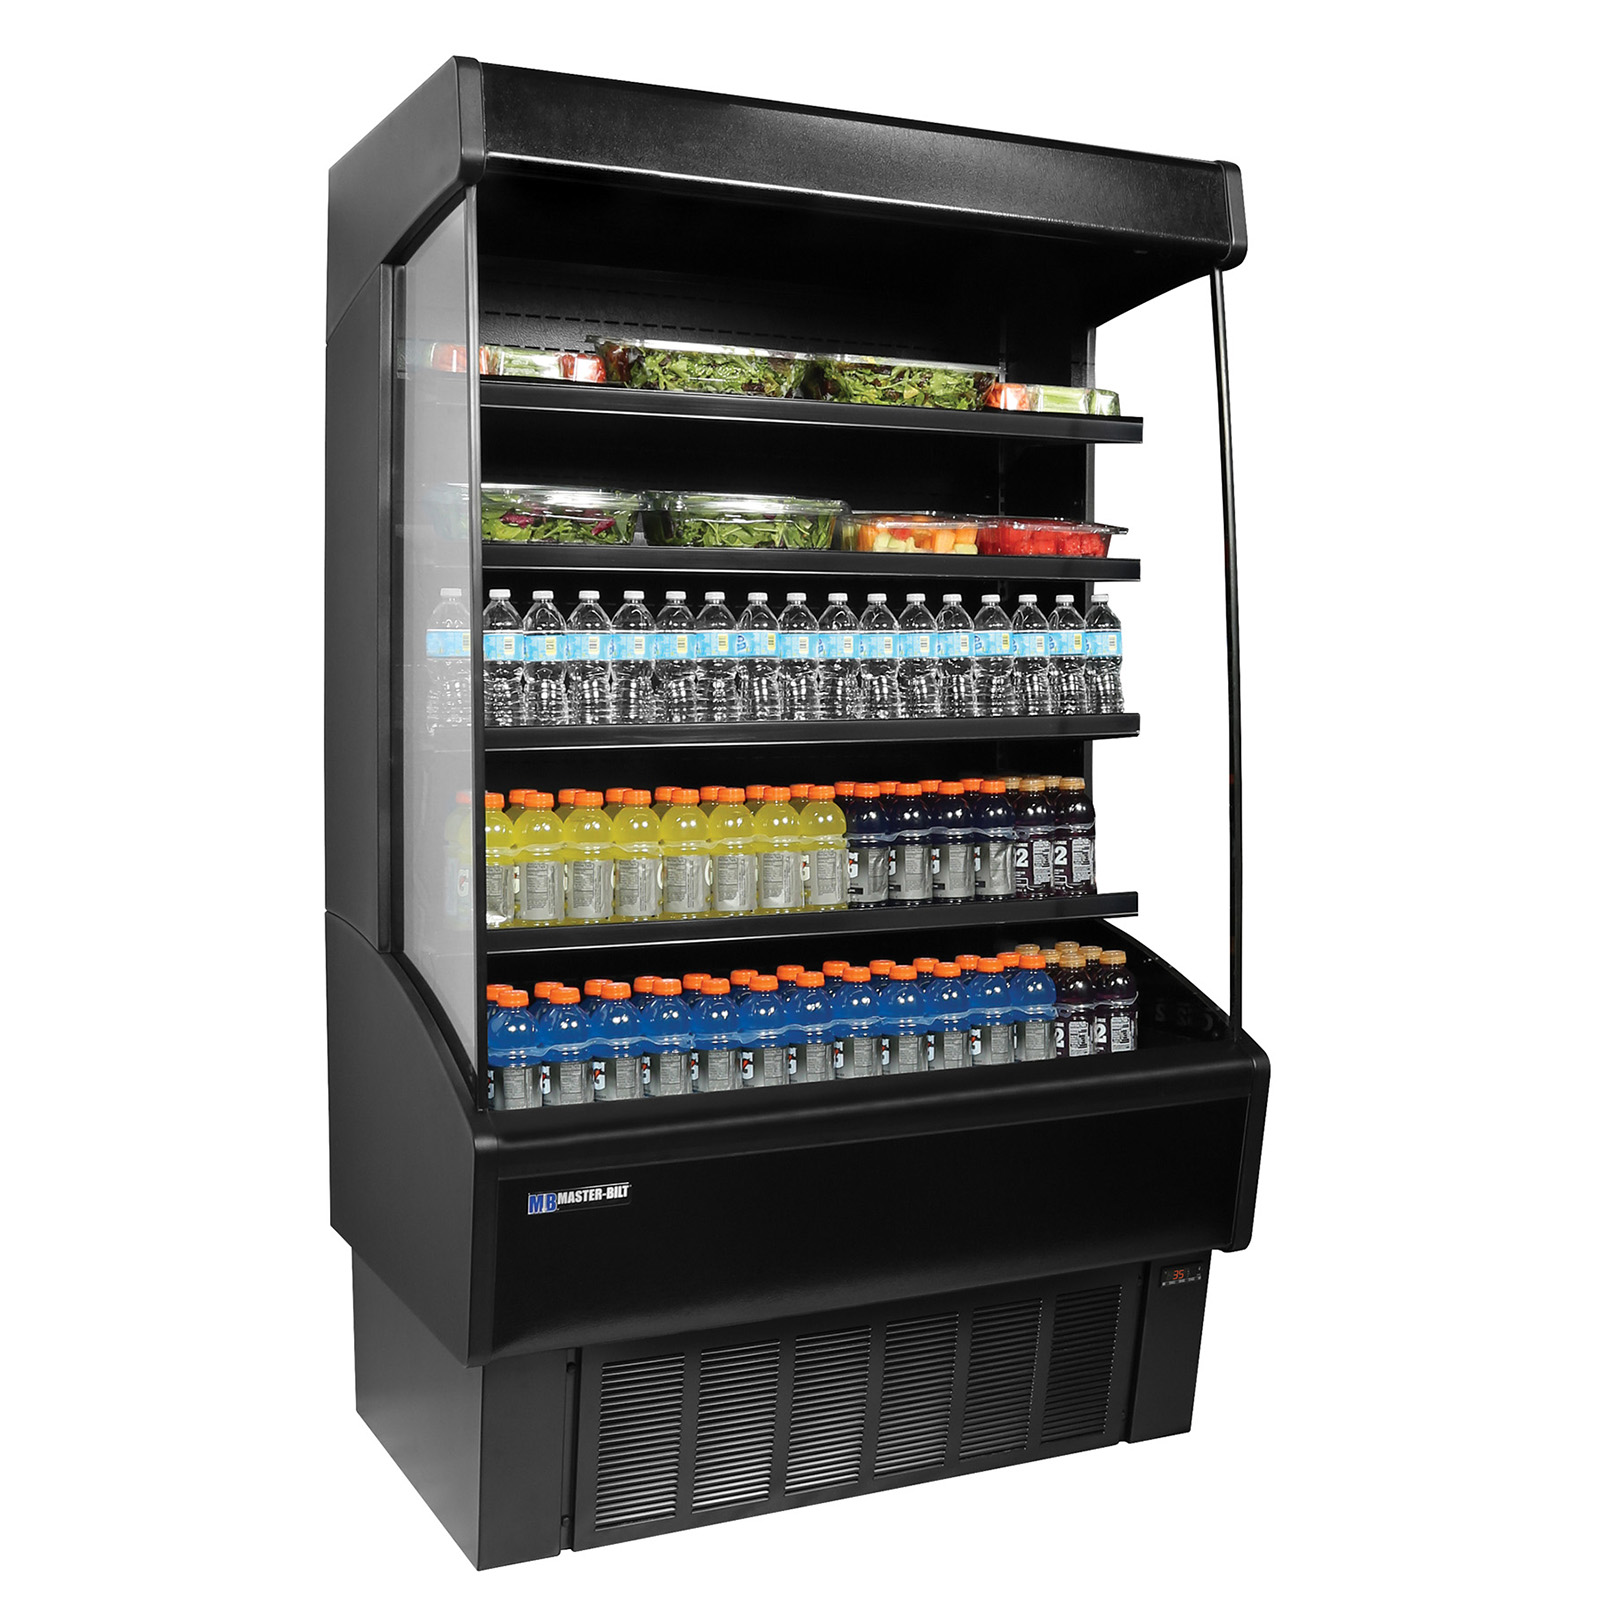 masterbilt-voam48-79r-vertical-open-air-refrigerated-merchandiser.jpg